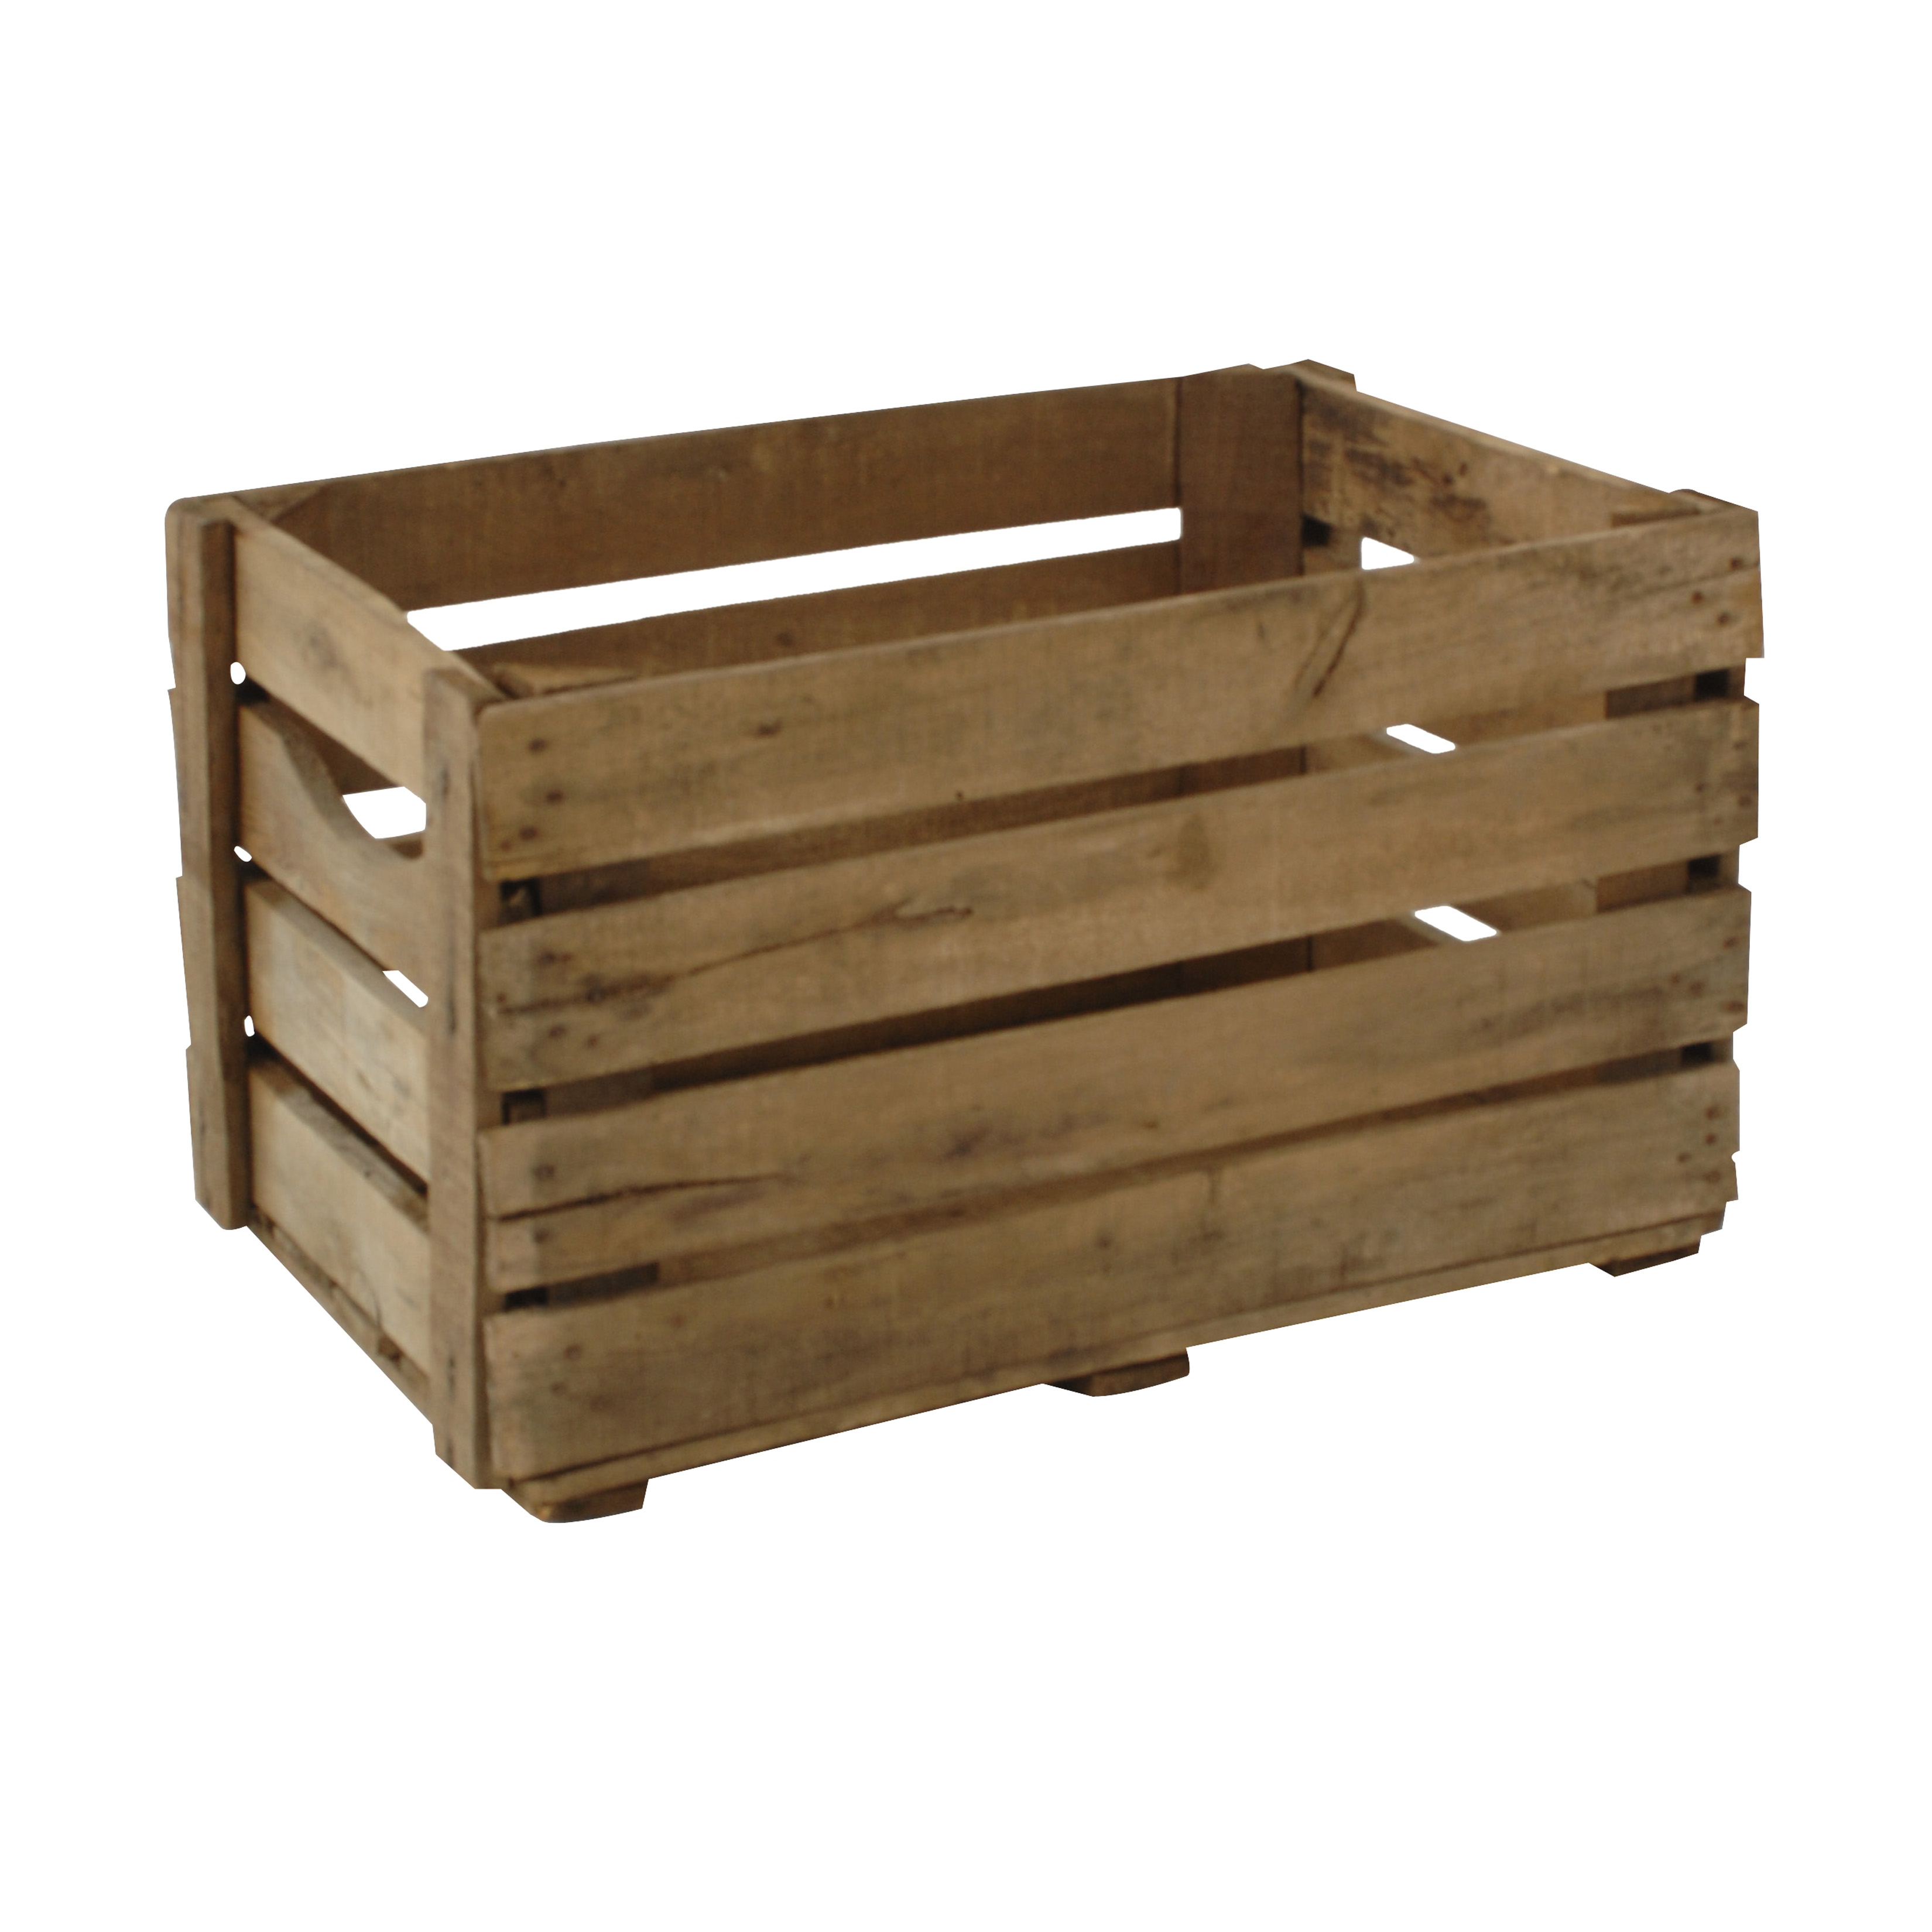 Royce Wooden Crates